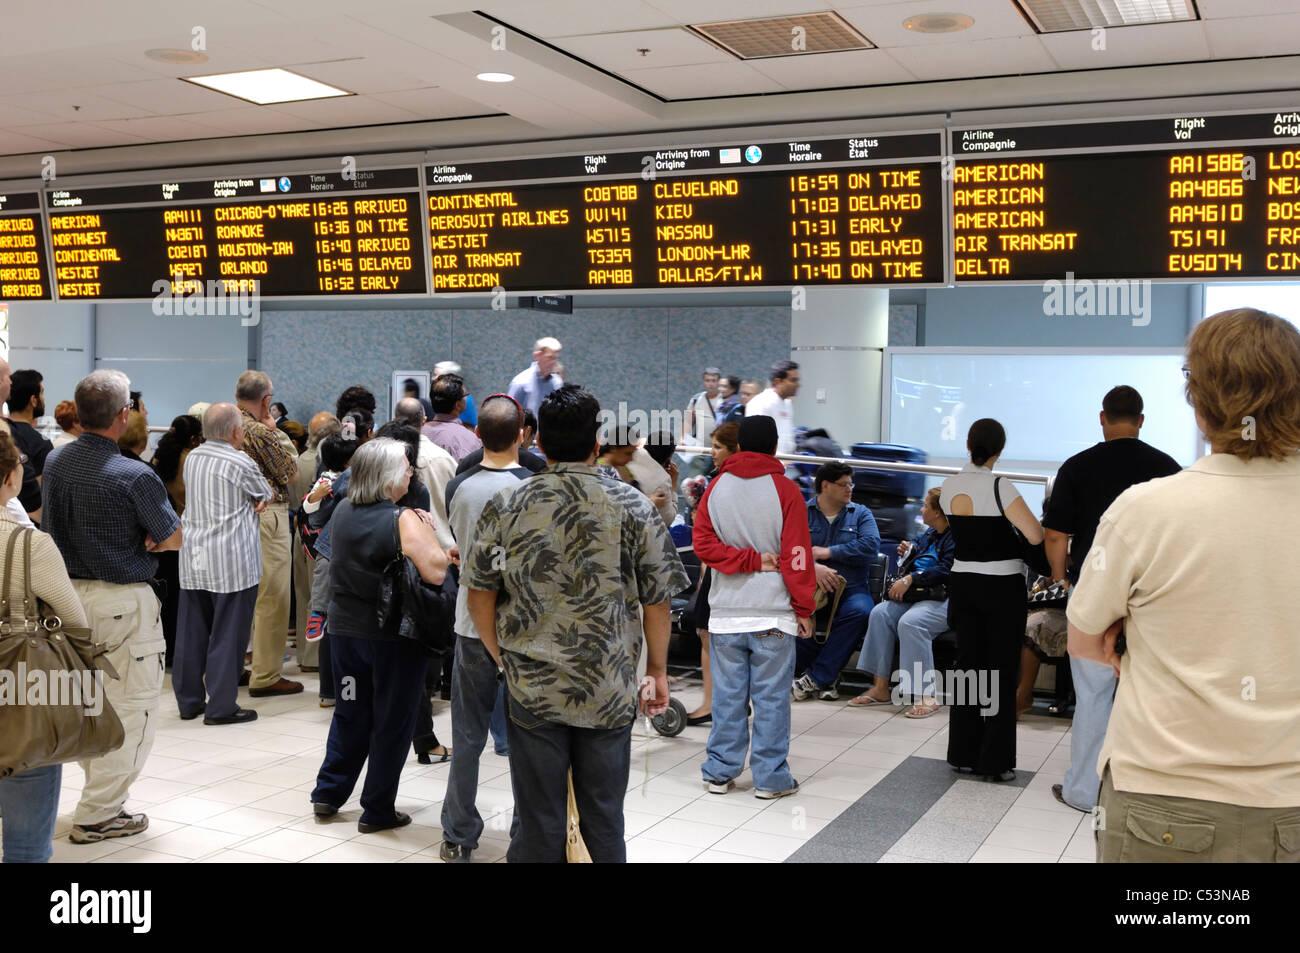 Wartenden am Ankünfte Hall von Toronto Pearson International Airport. Ontario, Kanada 2009. Stockbild